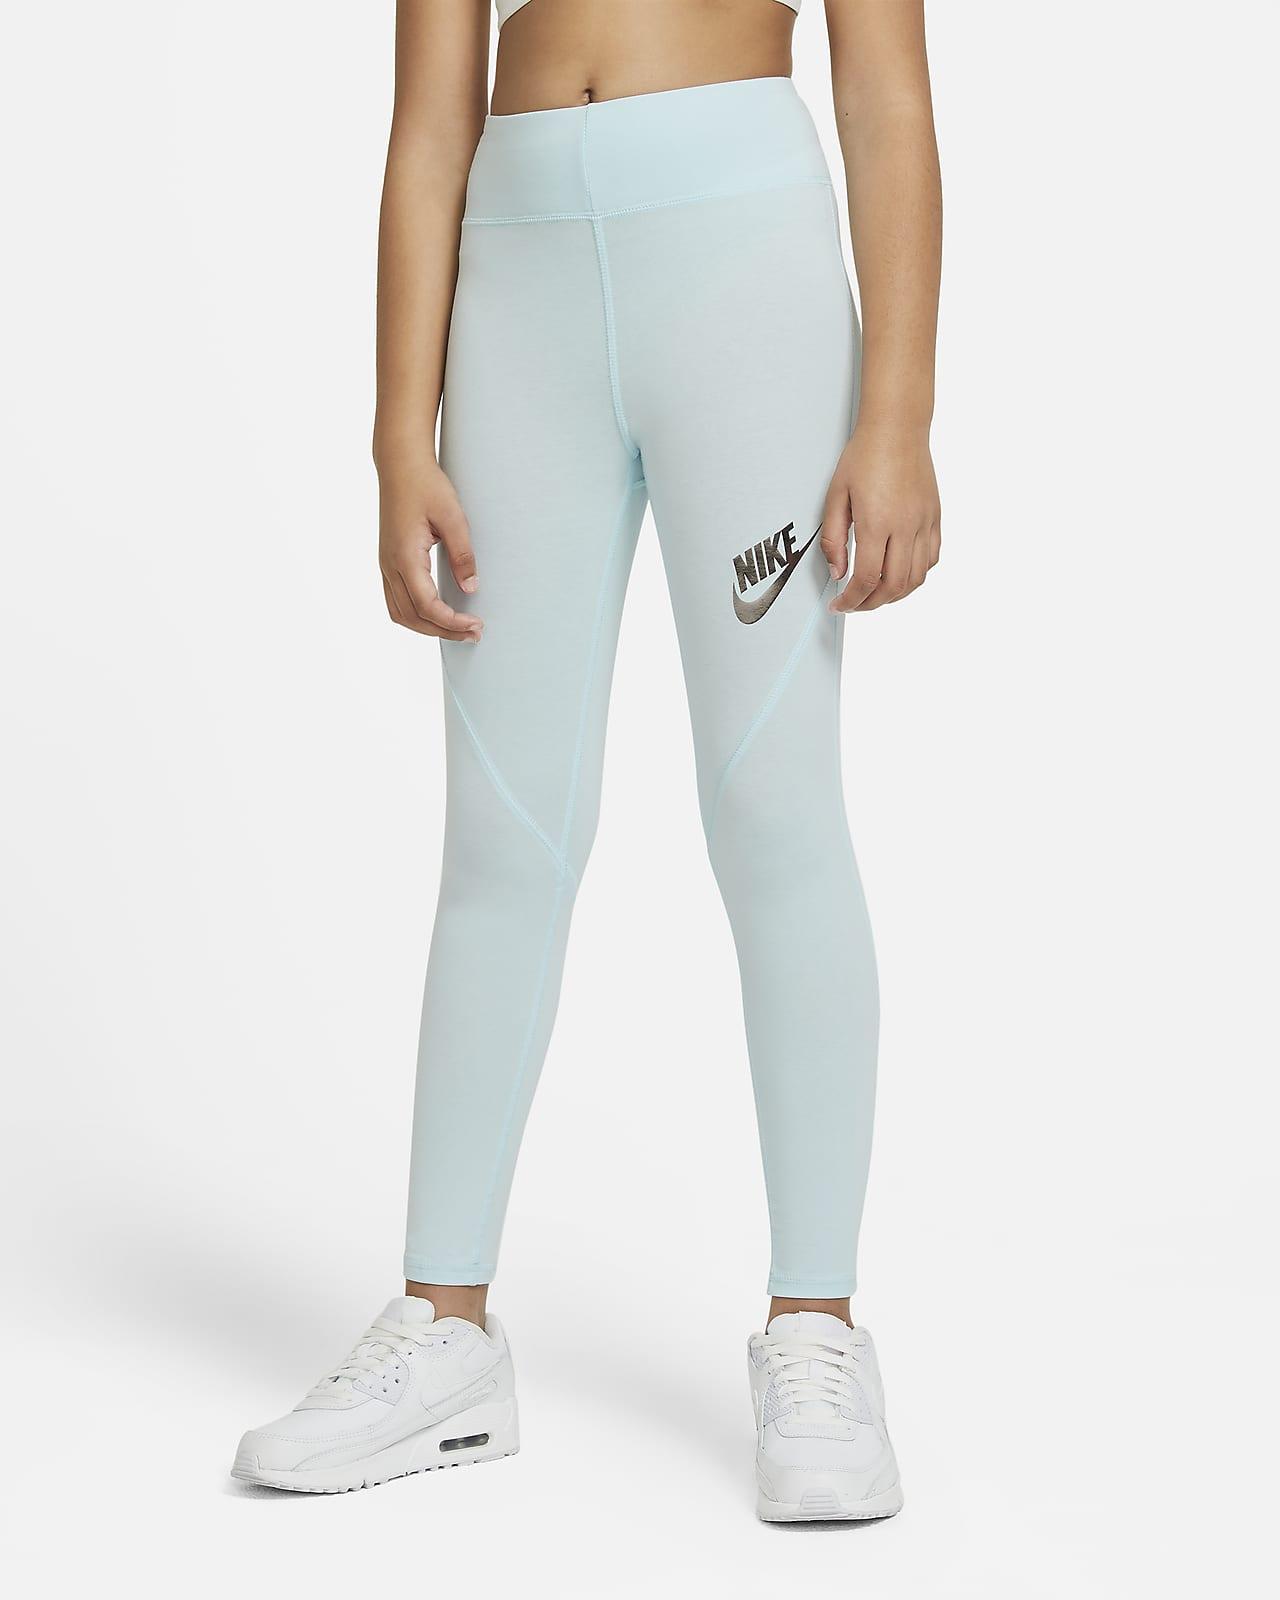 Nike Sportswear Favourites Older Kids' (Girls') High-Waisted Leggings